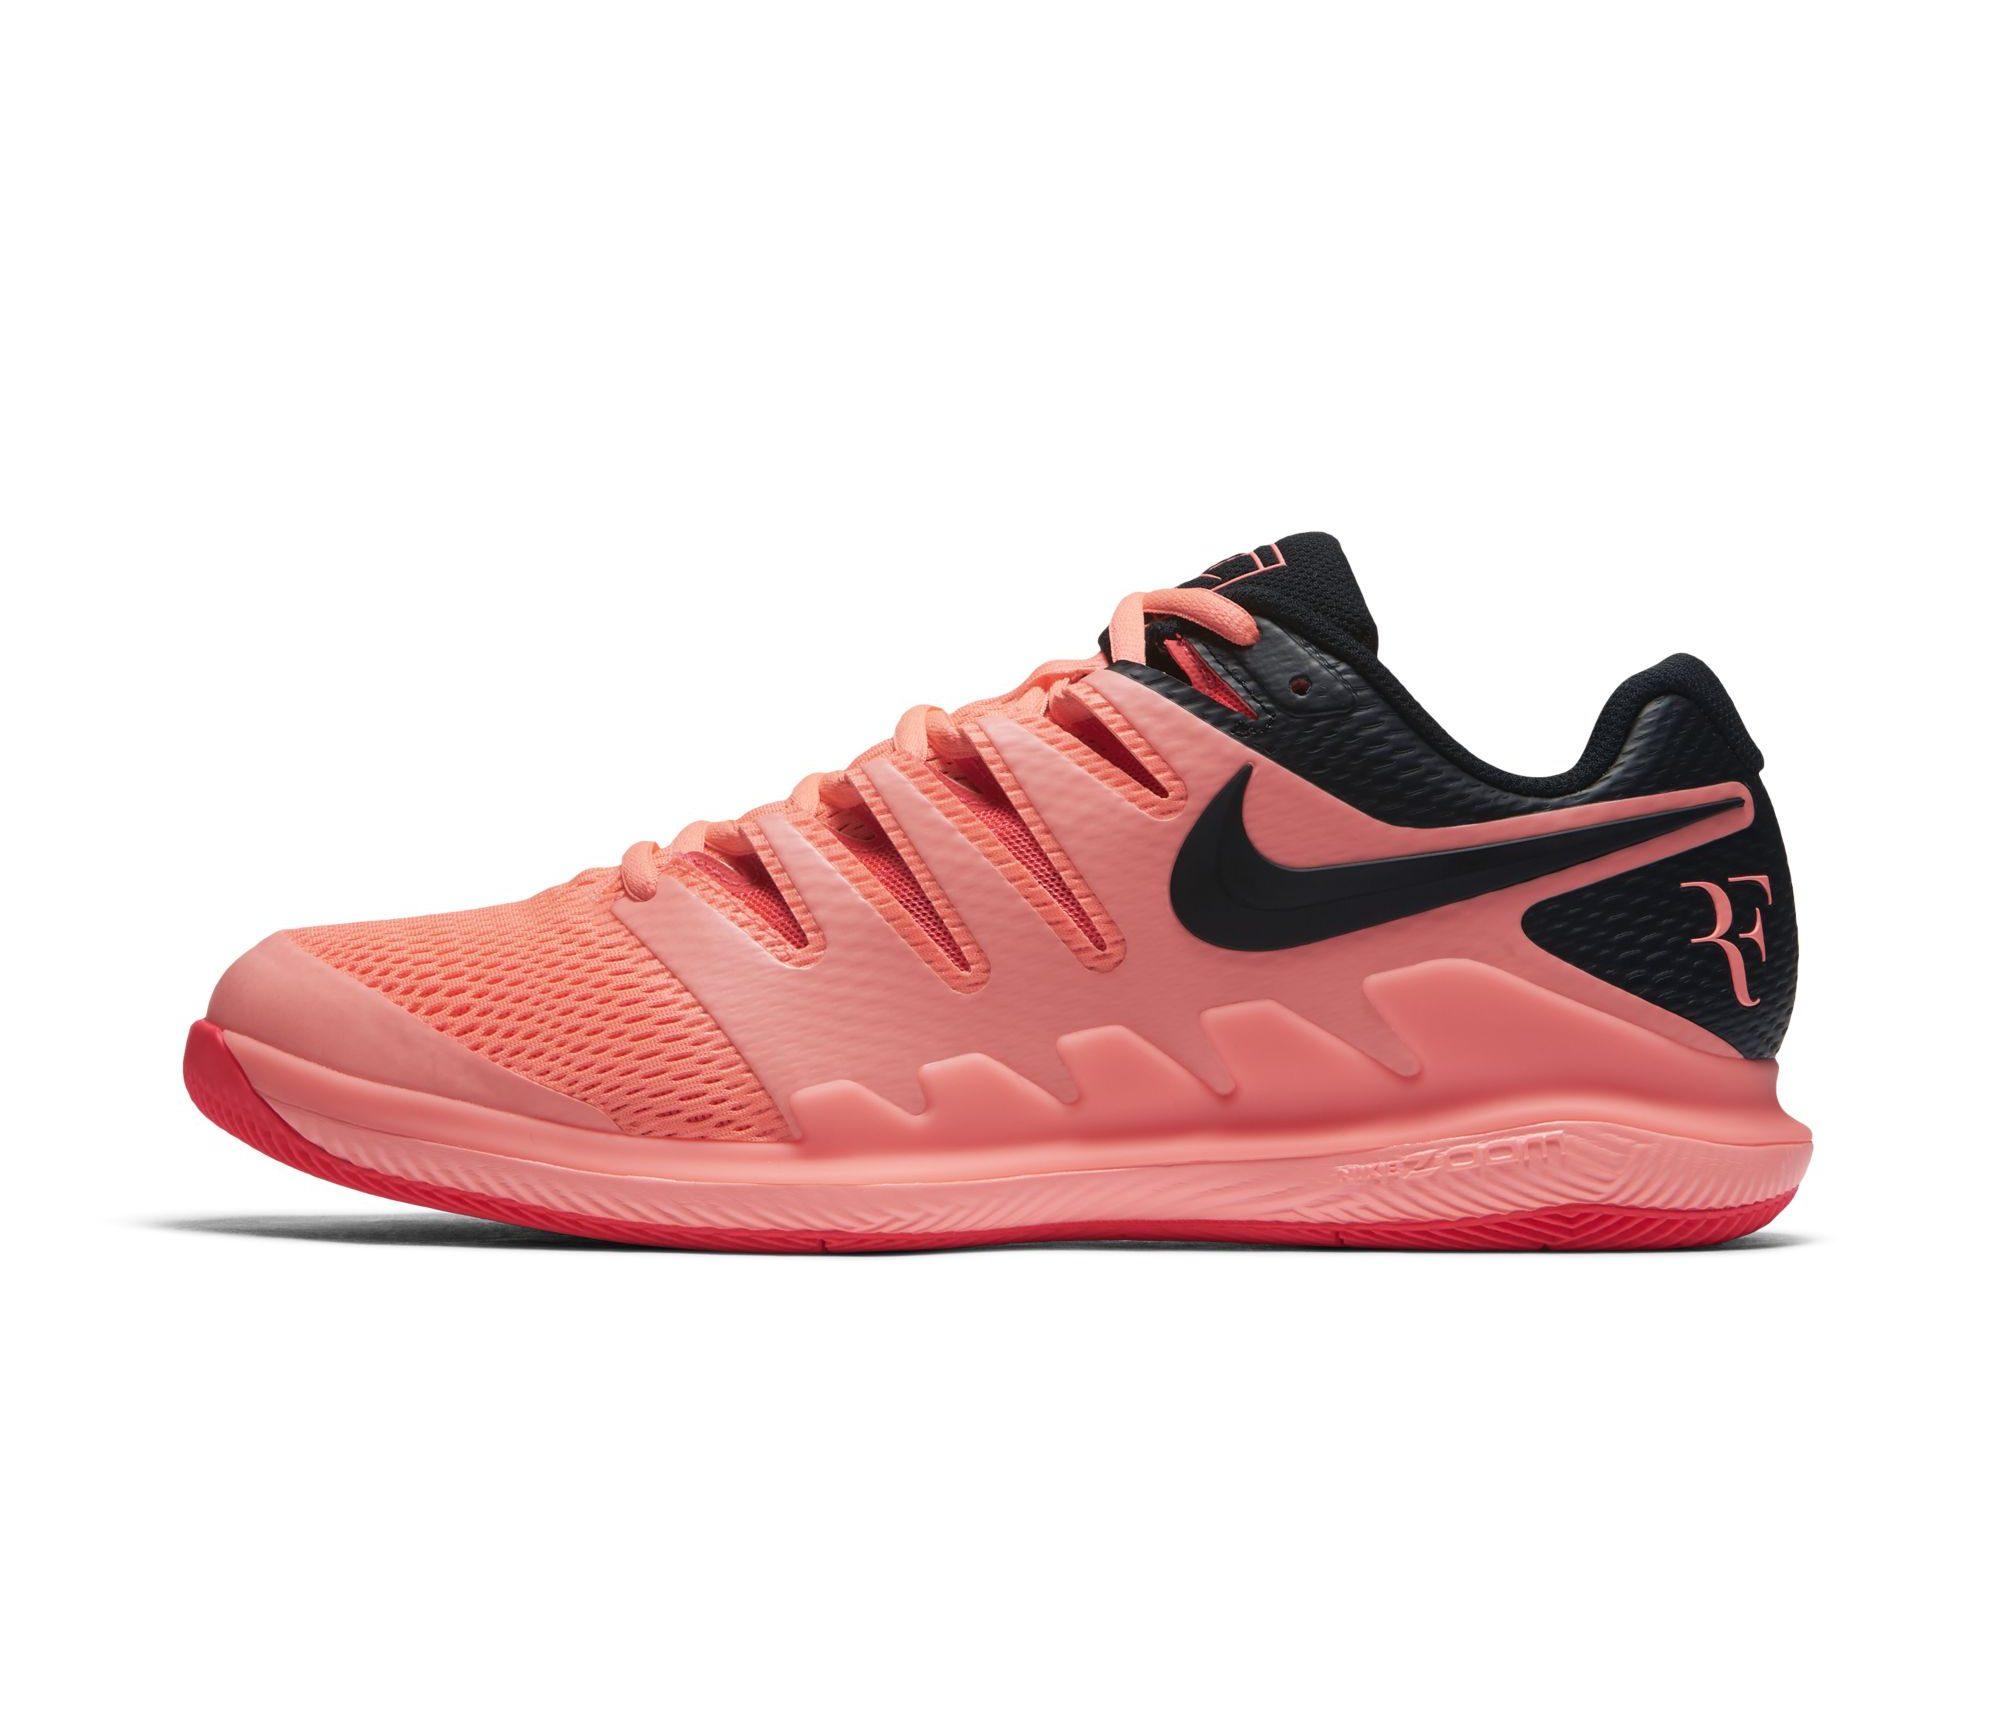 save off 9baa3 c5407 Kicks On Court   Nike   Tennis ...